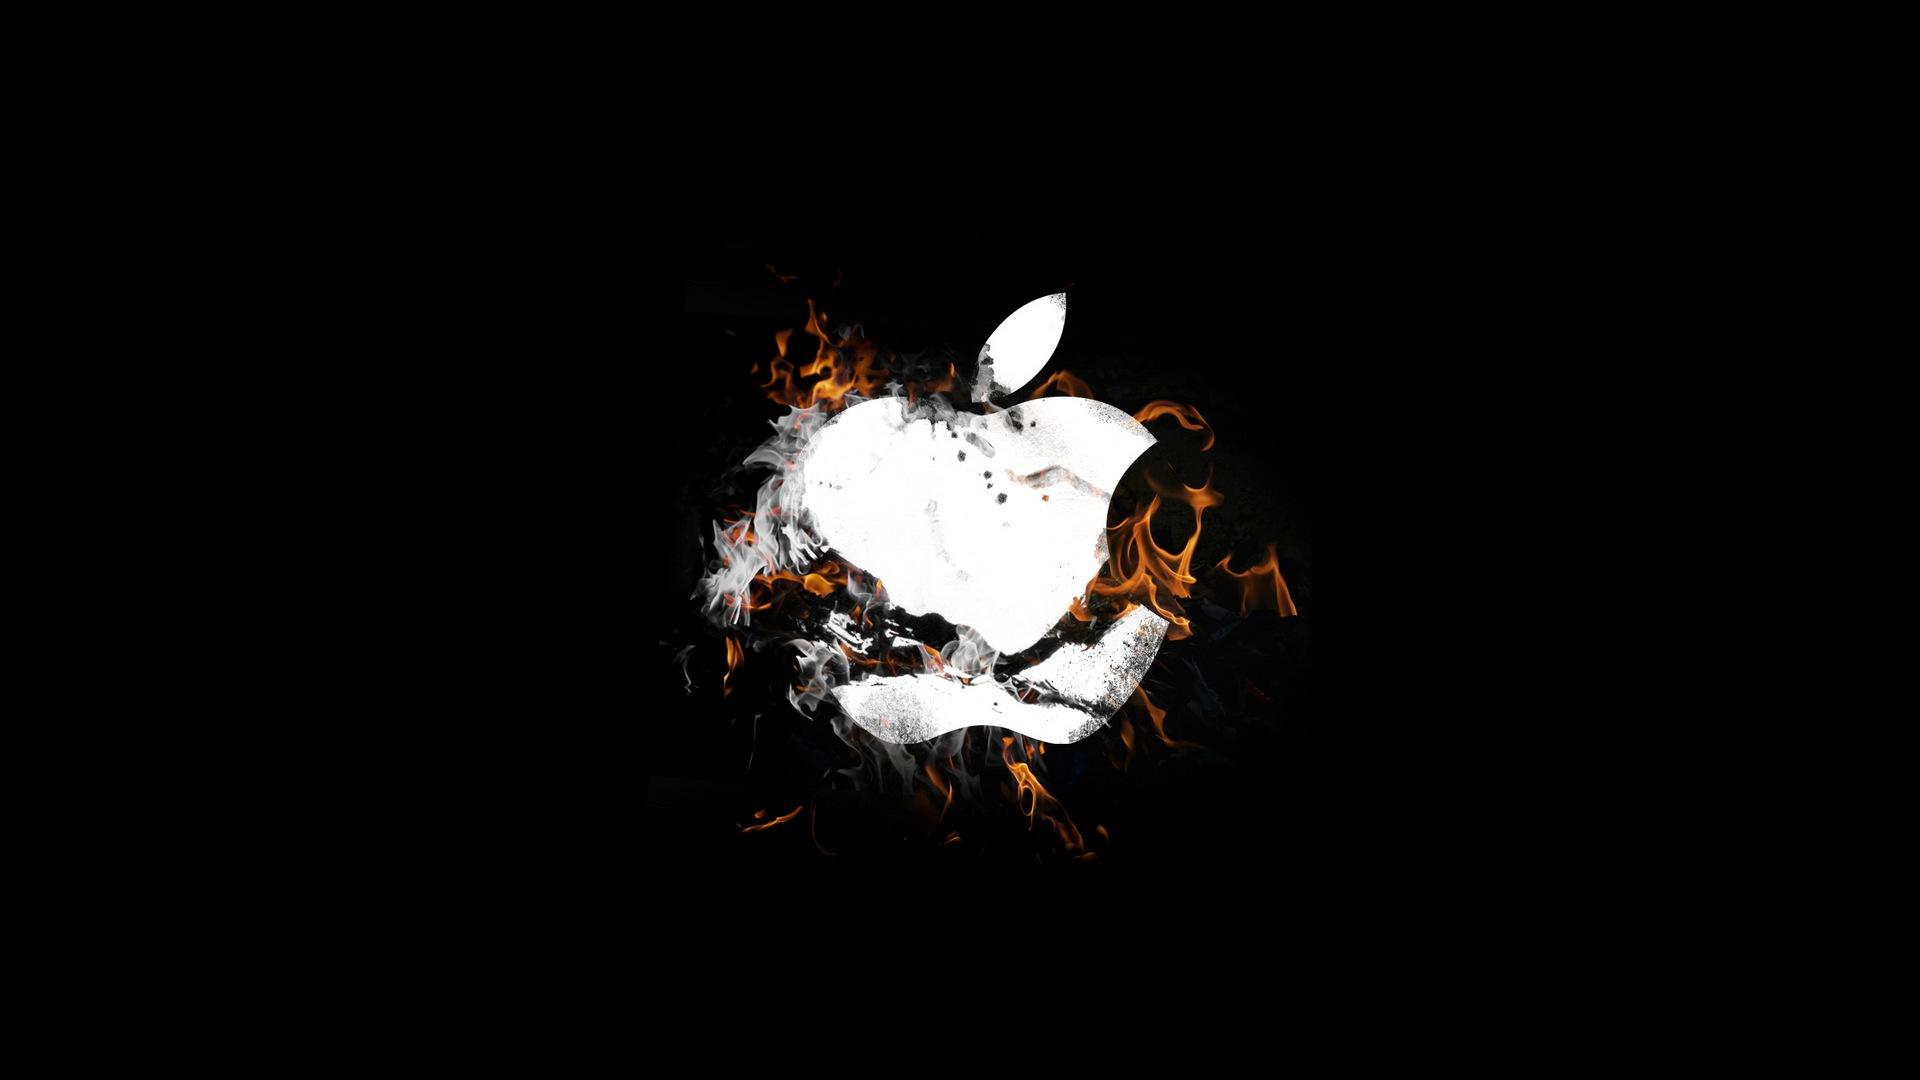 Iphone Hd Retina Wallpapers 182 Best Mac Wallpapers Apple Mac Full Hd Wallpapers